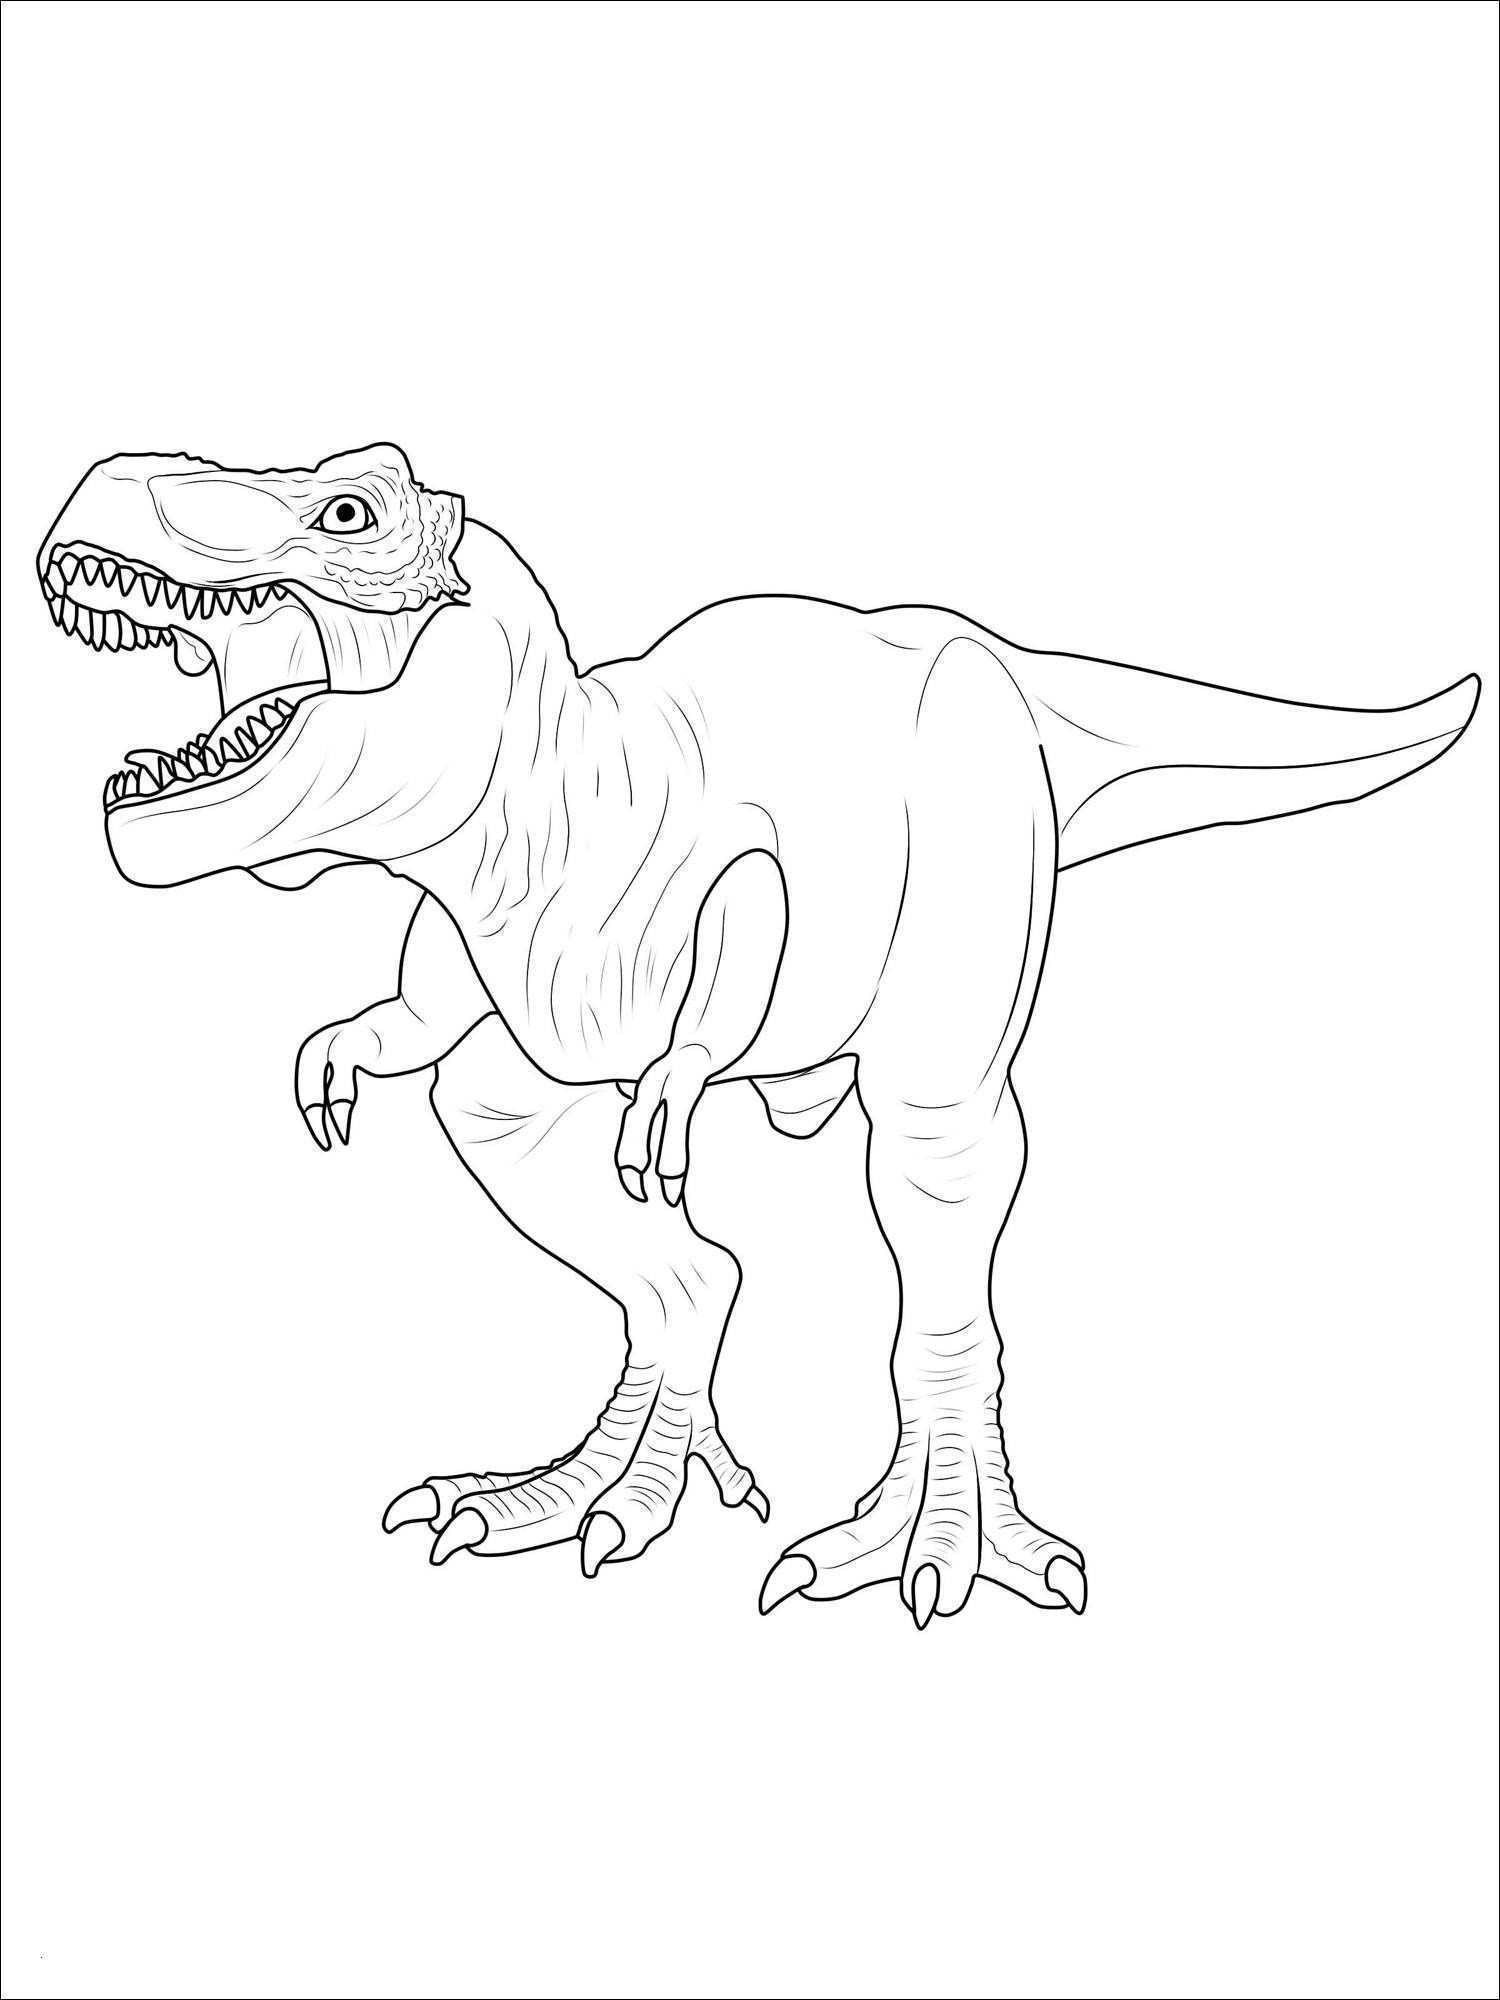 Tyrannosaurus Rex Ausmalbild Das Beste Von T Rex Ausmalbilder Bild Tyrannosaurus Rex Ausmalbilder Best Unique Fotos